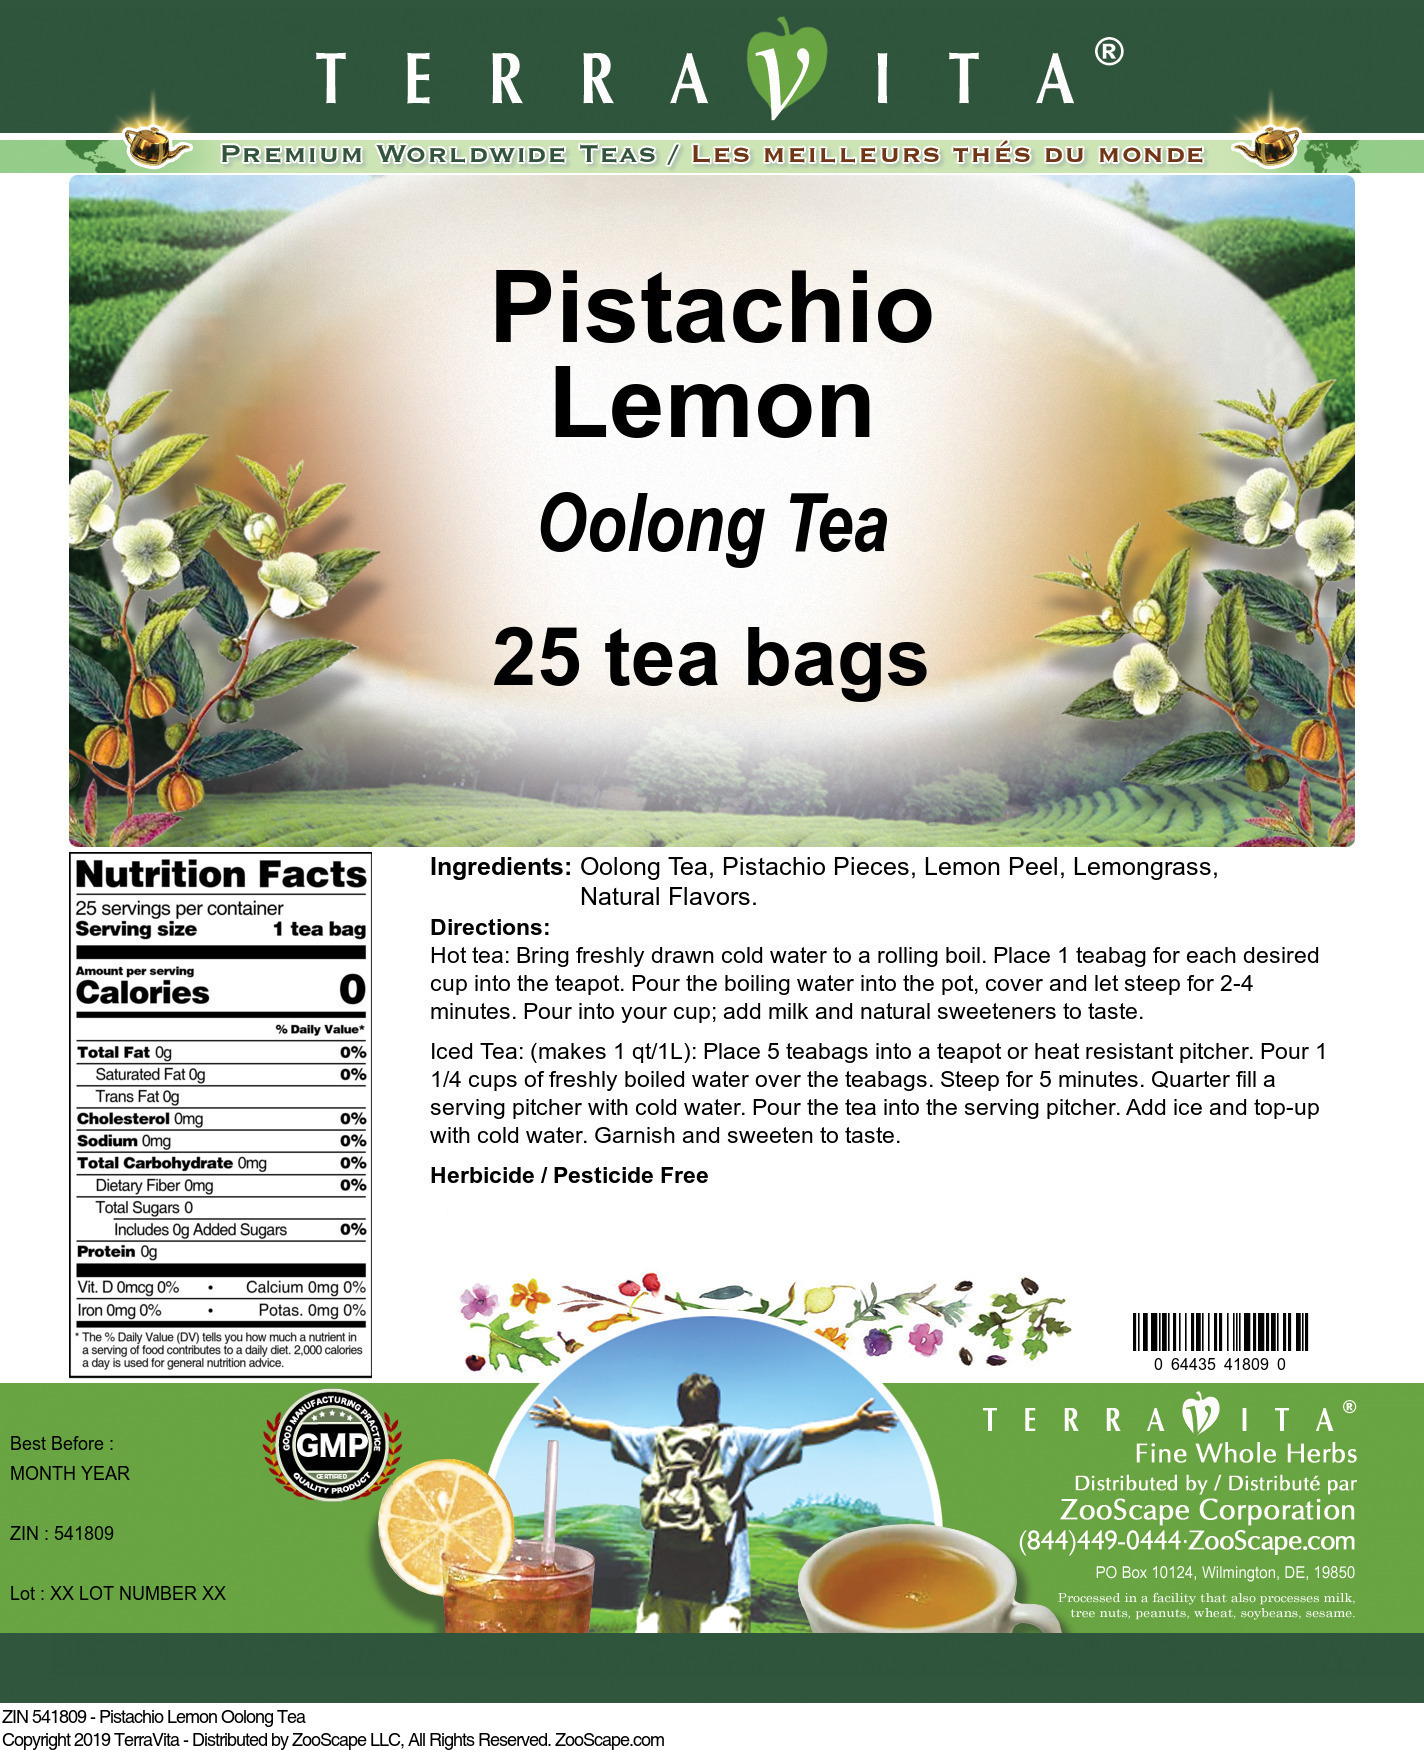 Pistachio Lemon Oolong Tea